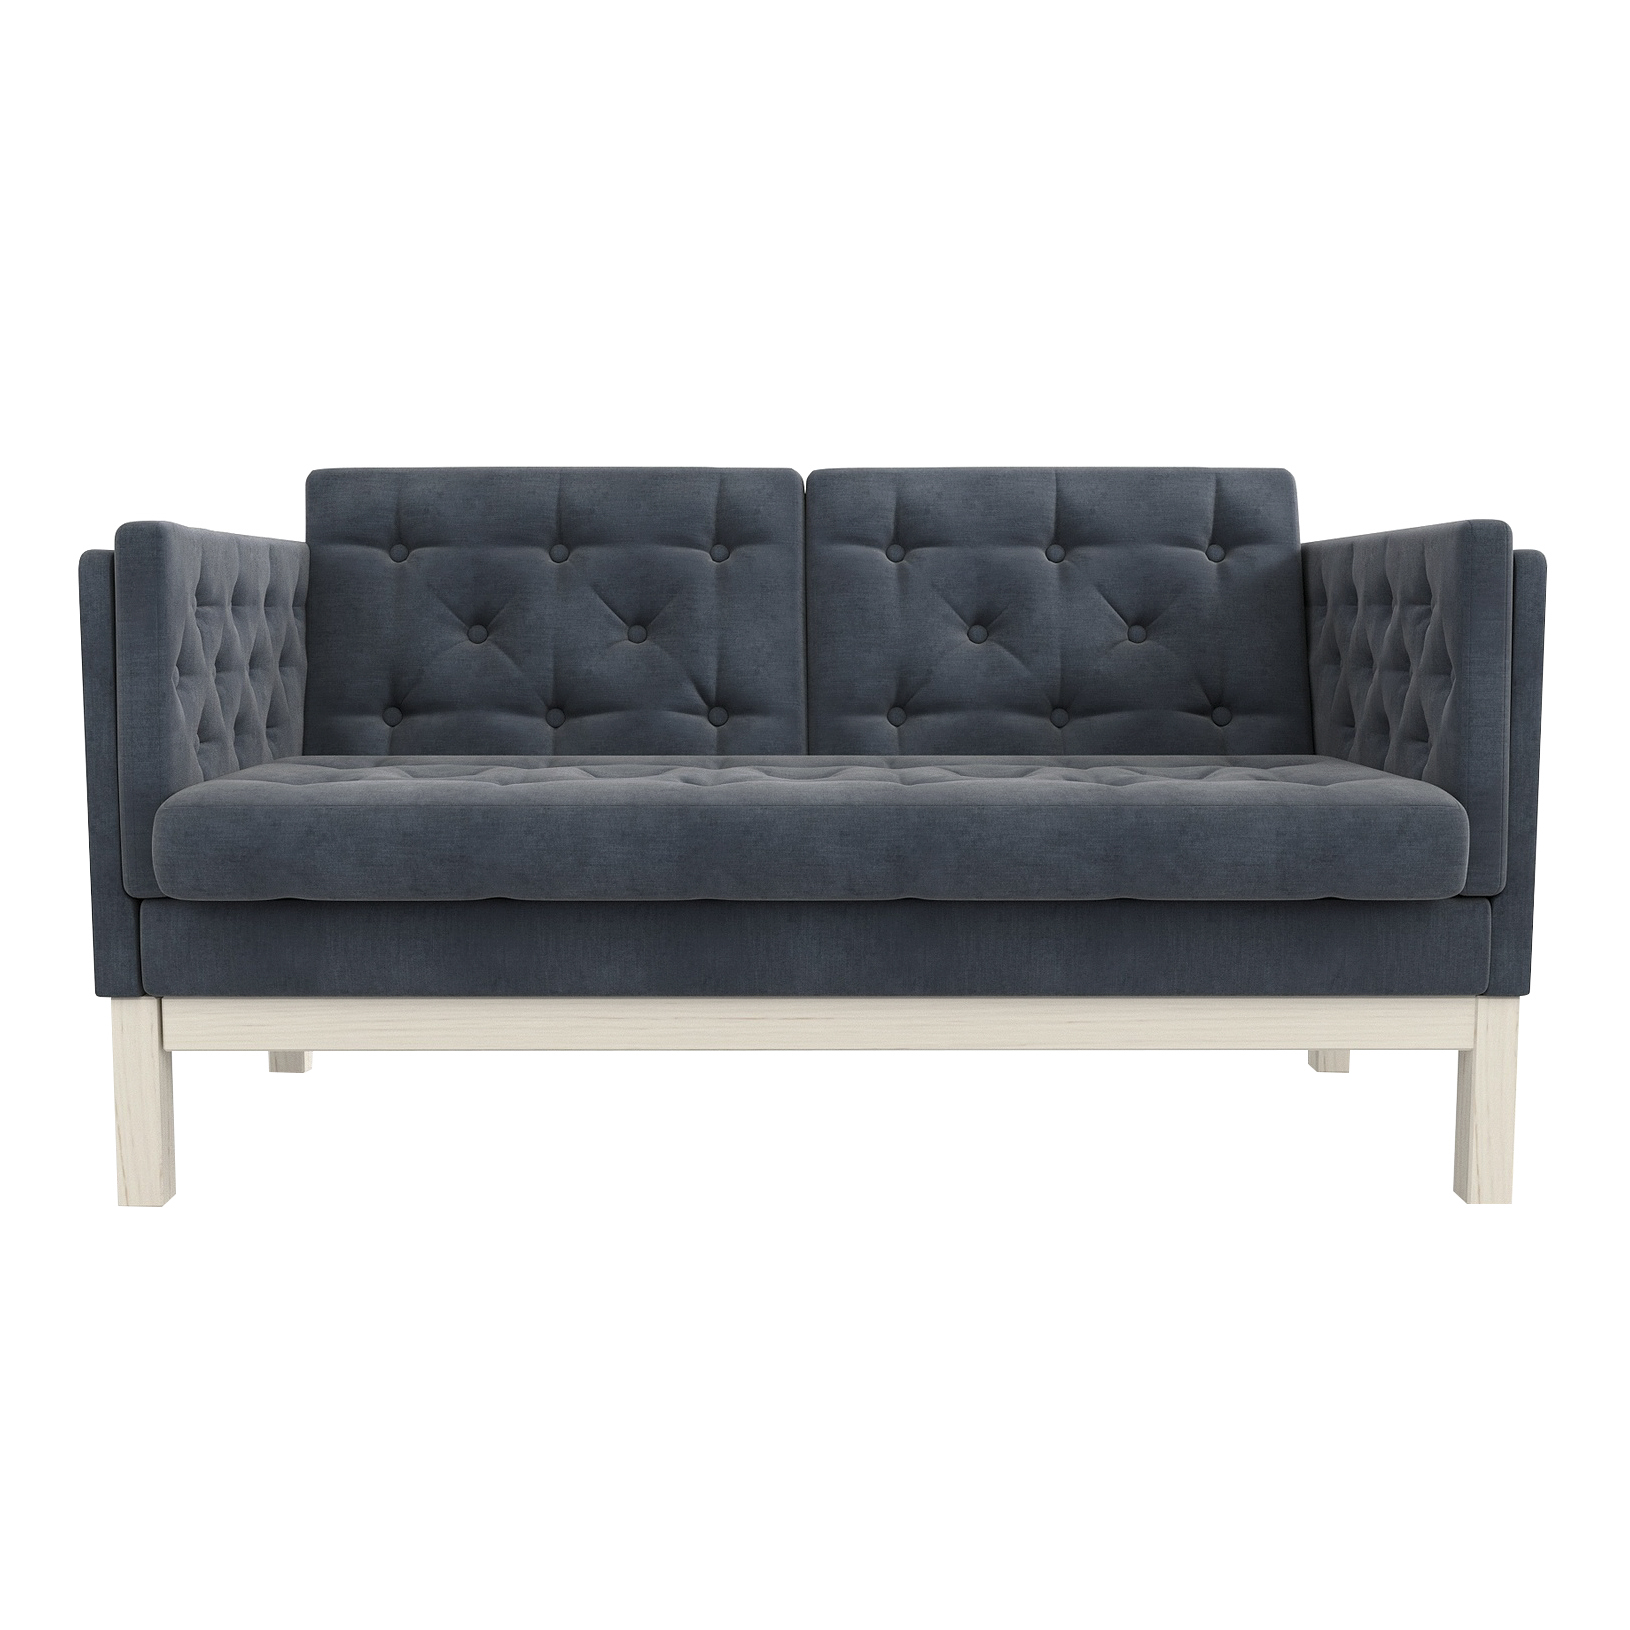 Фото - Диван AS Алана м 154x82x83 беленый дуб/серый диван as алана м 154x82x83 сосна коричневый